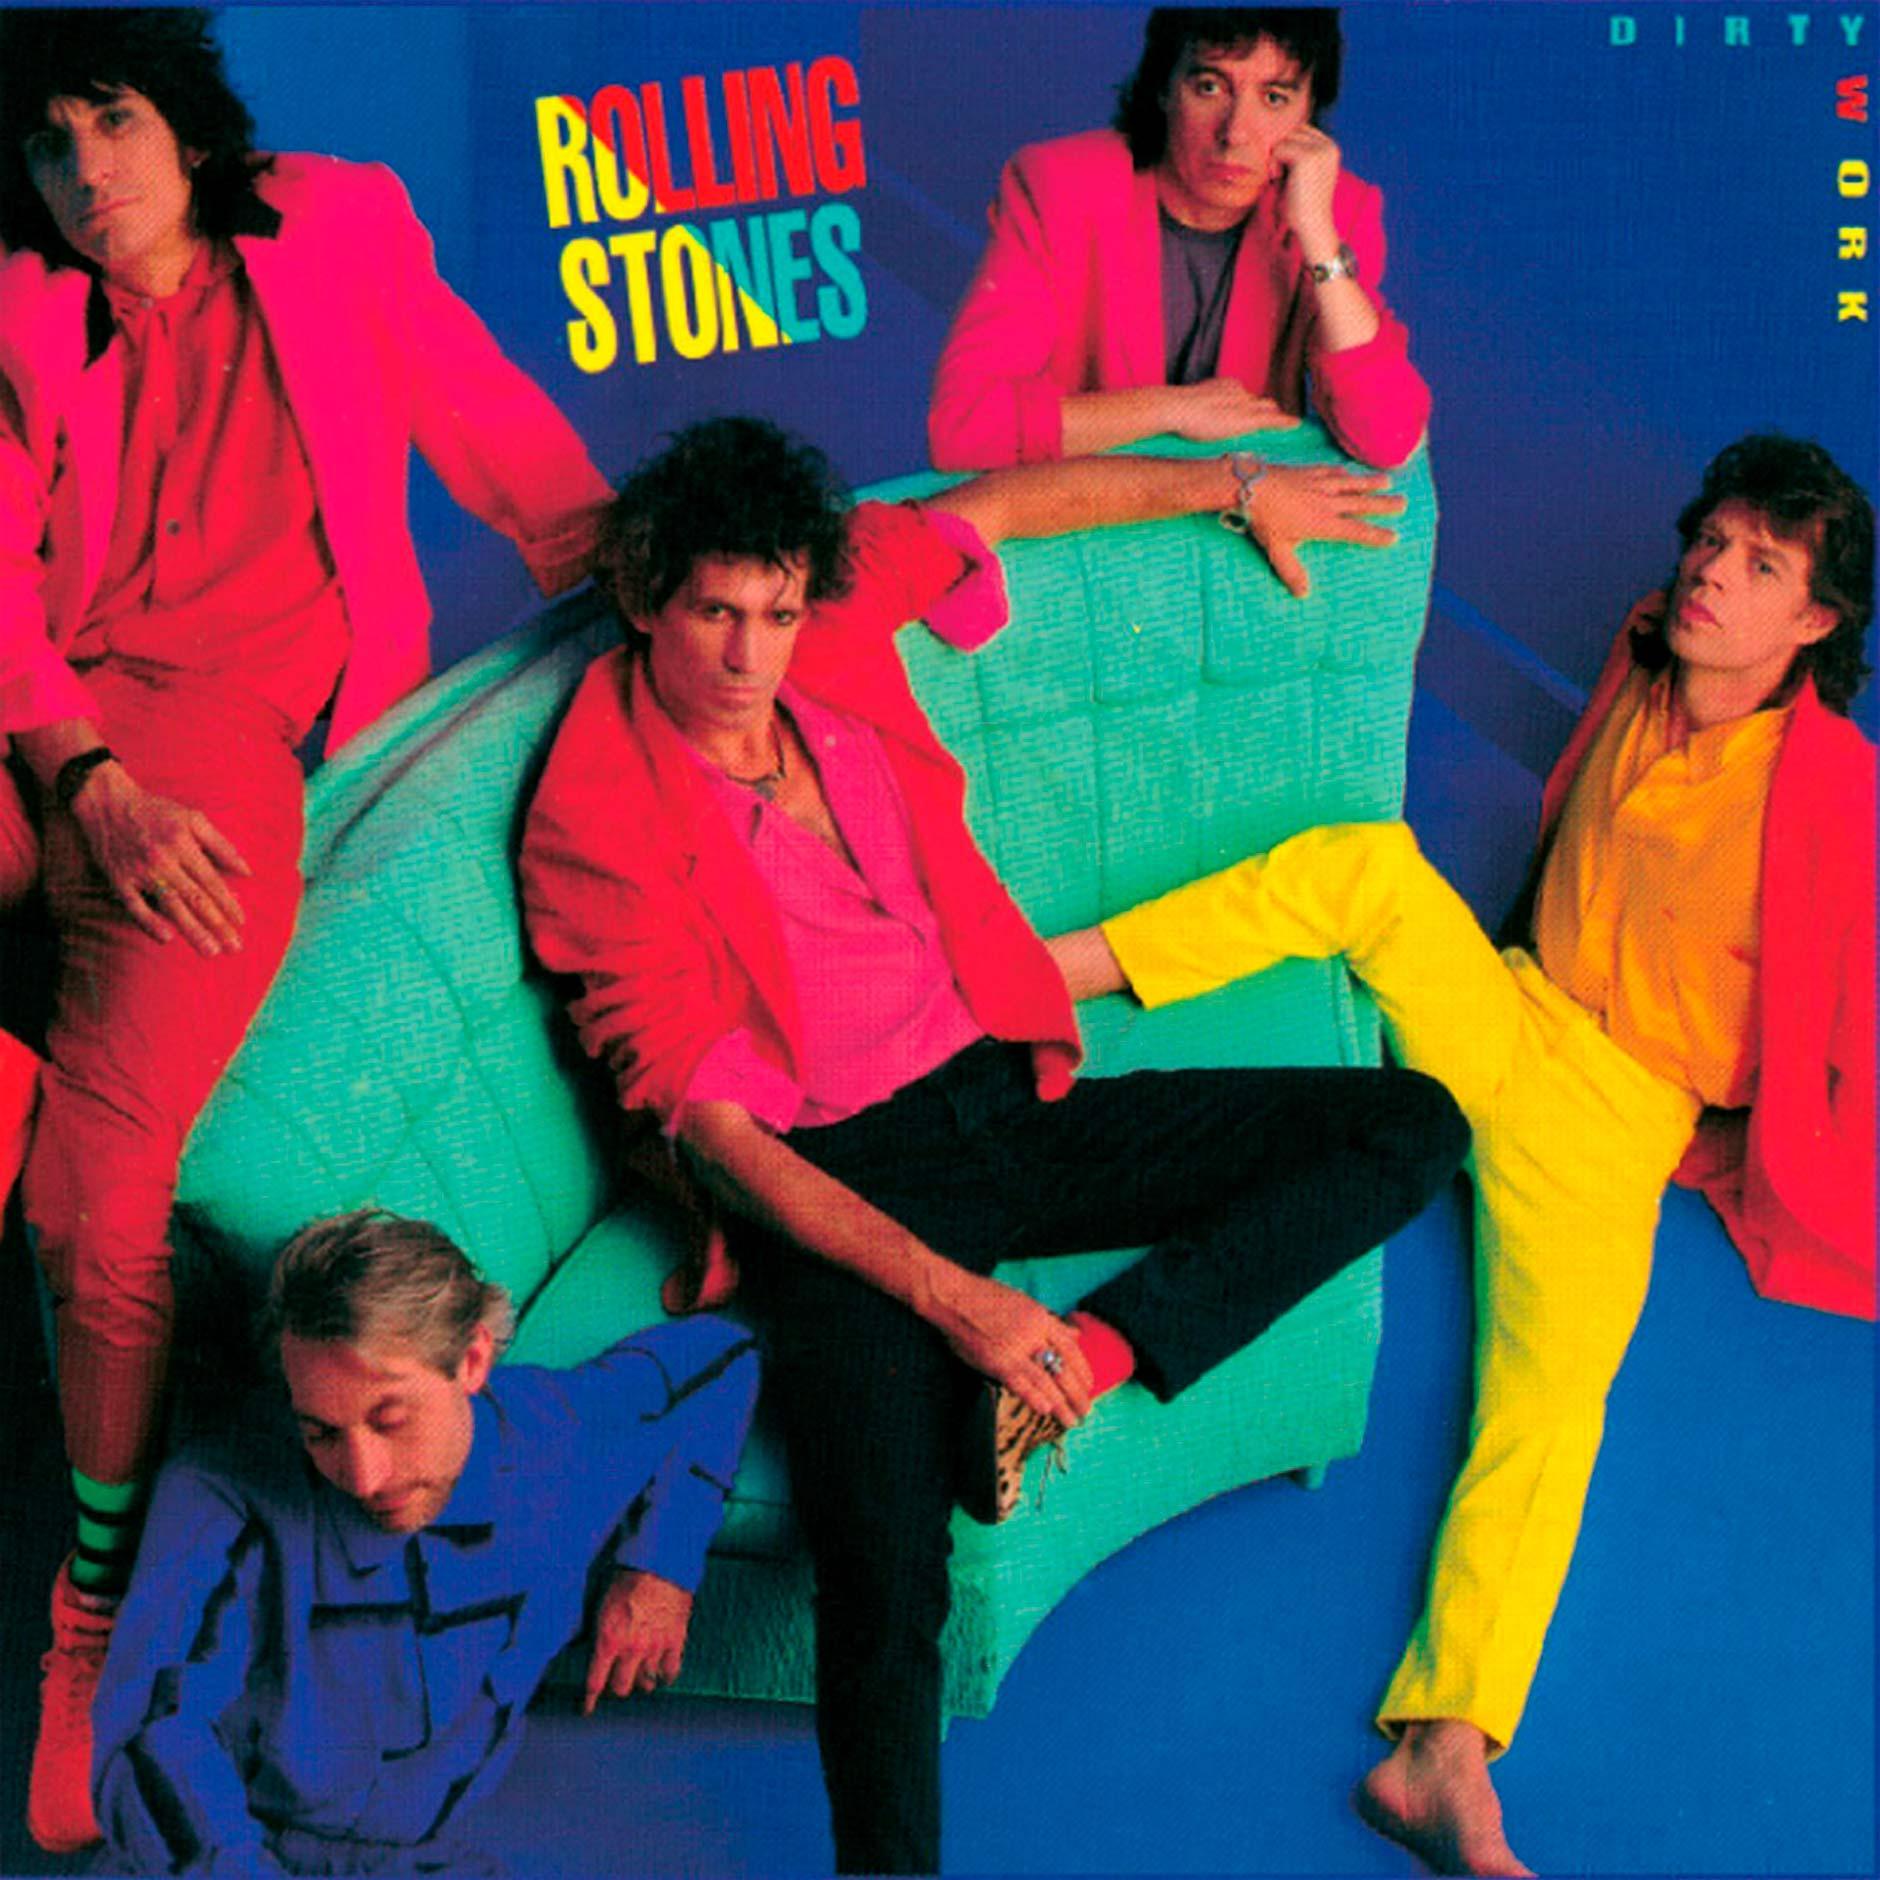 rollingstones_discosfeos